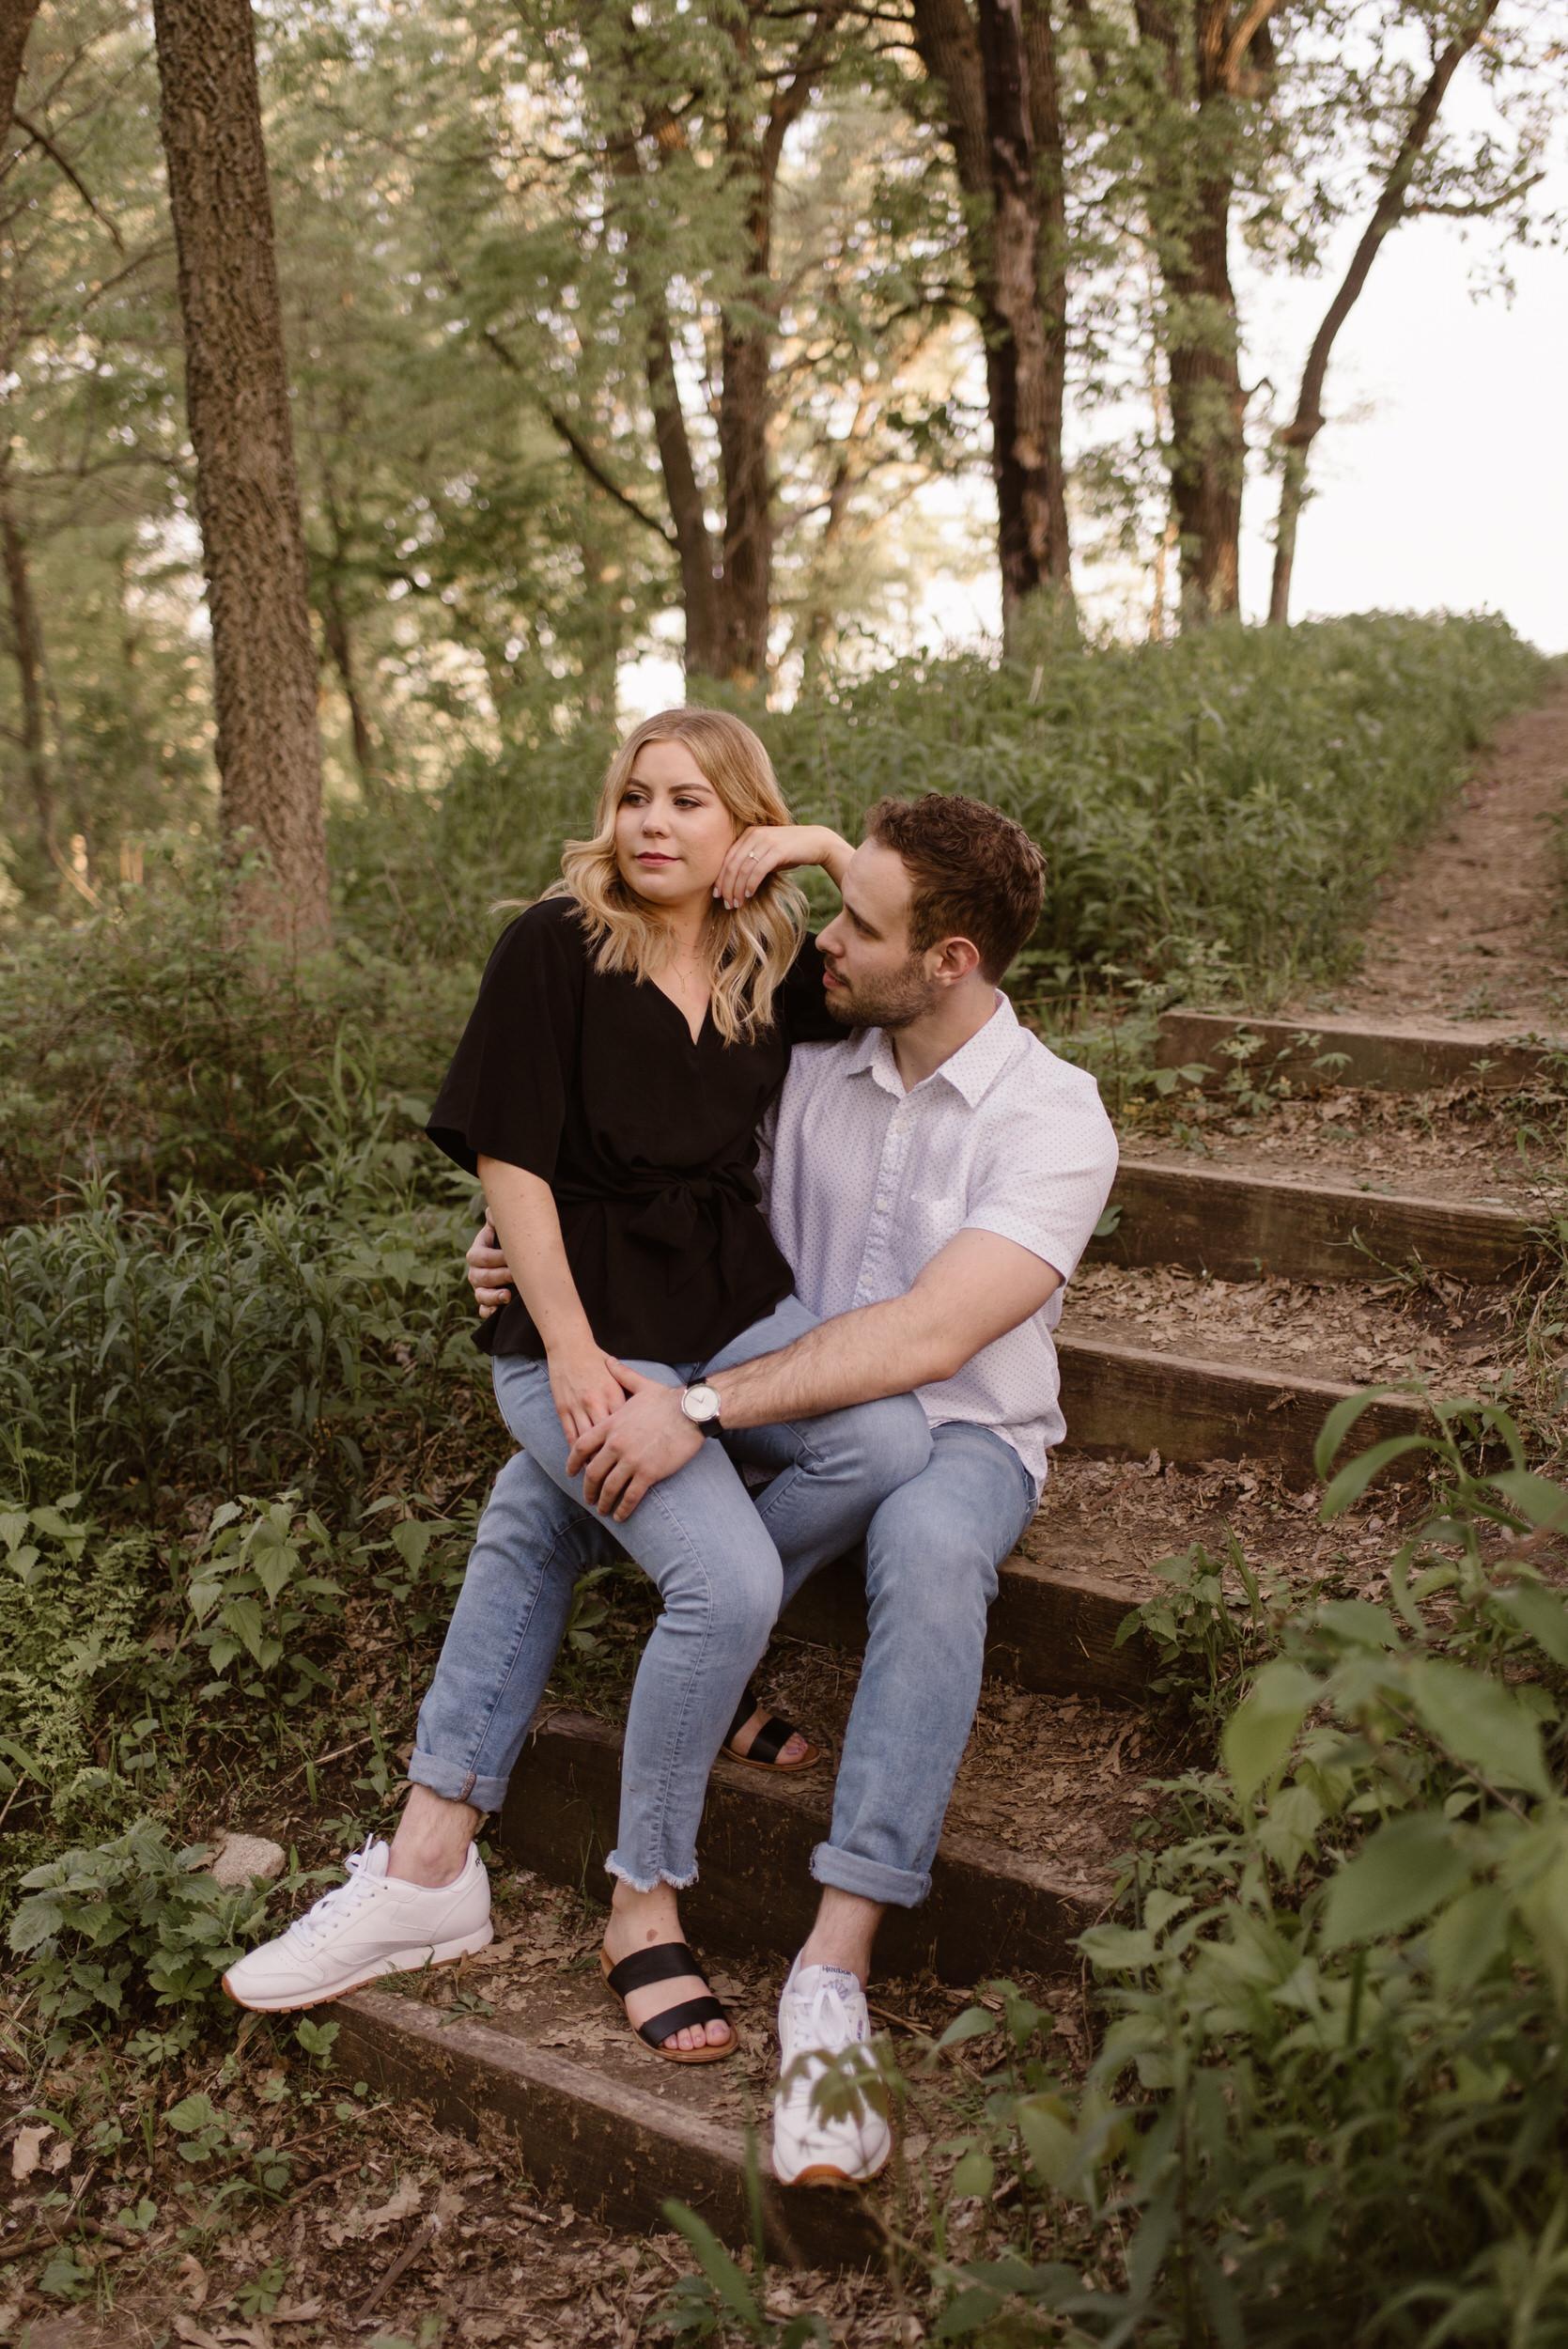 Omaha-Nebraska-Engagement-Session-Kaylie-Sirek-Photography-117.jpg